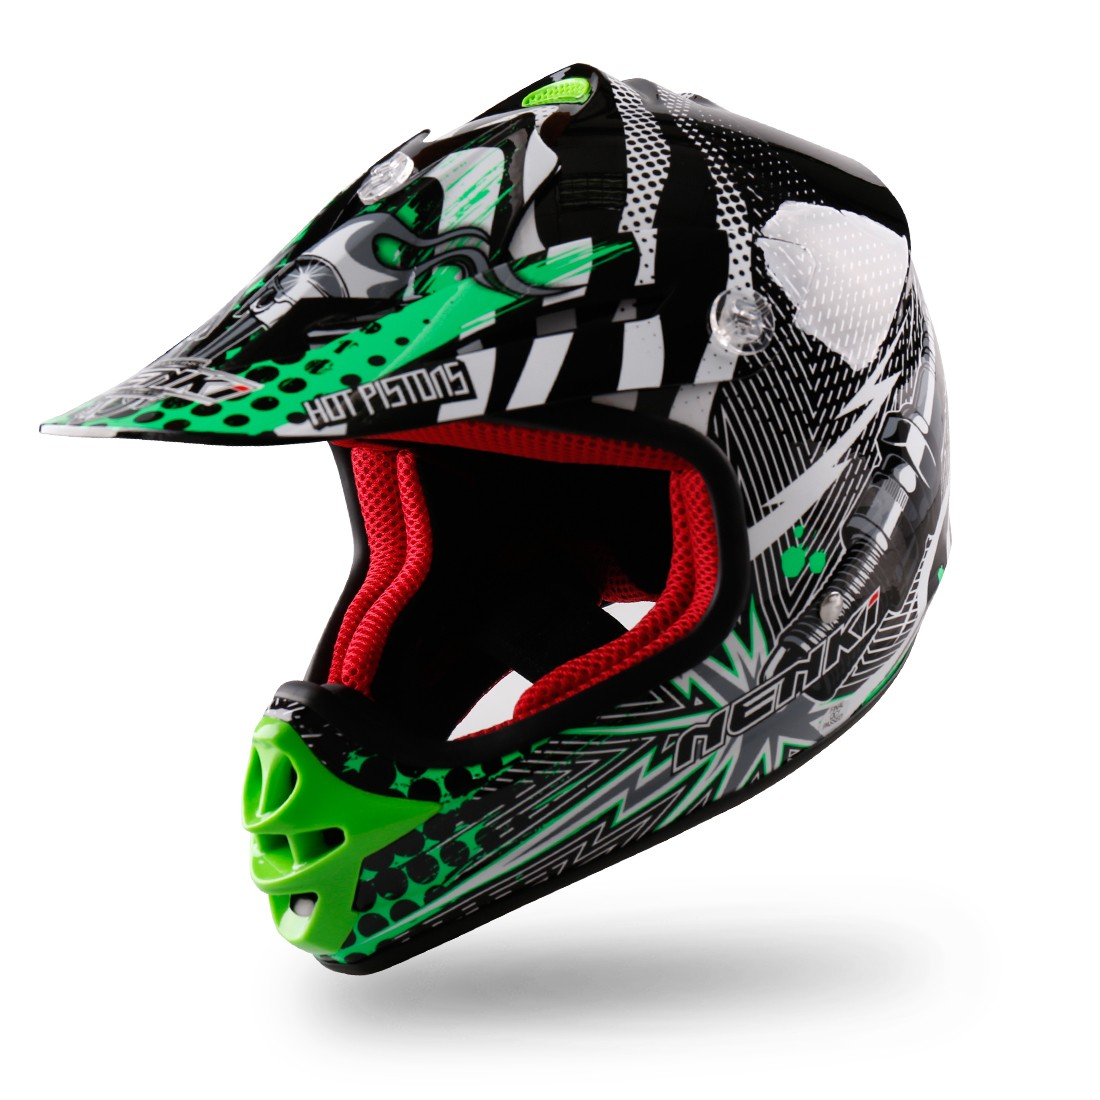 Nenki cool motocross helmets suppliers for motorcycle-4